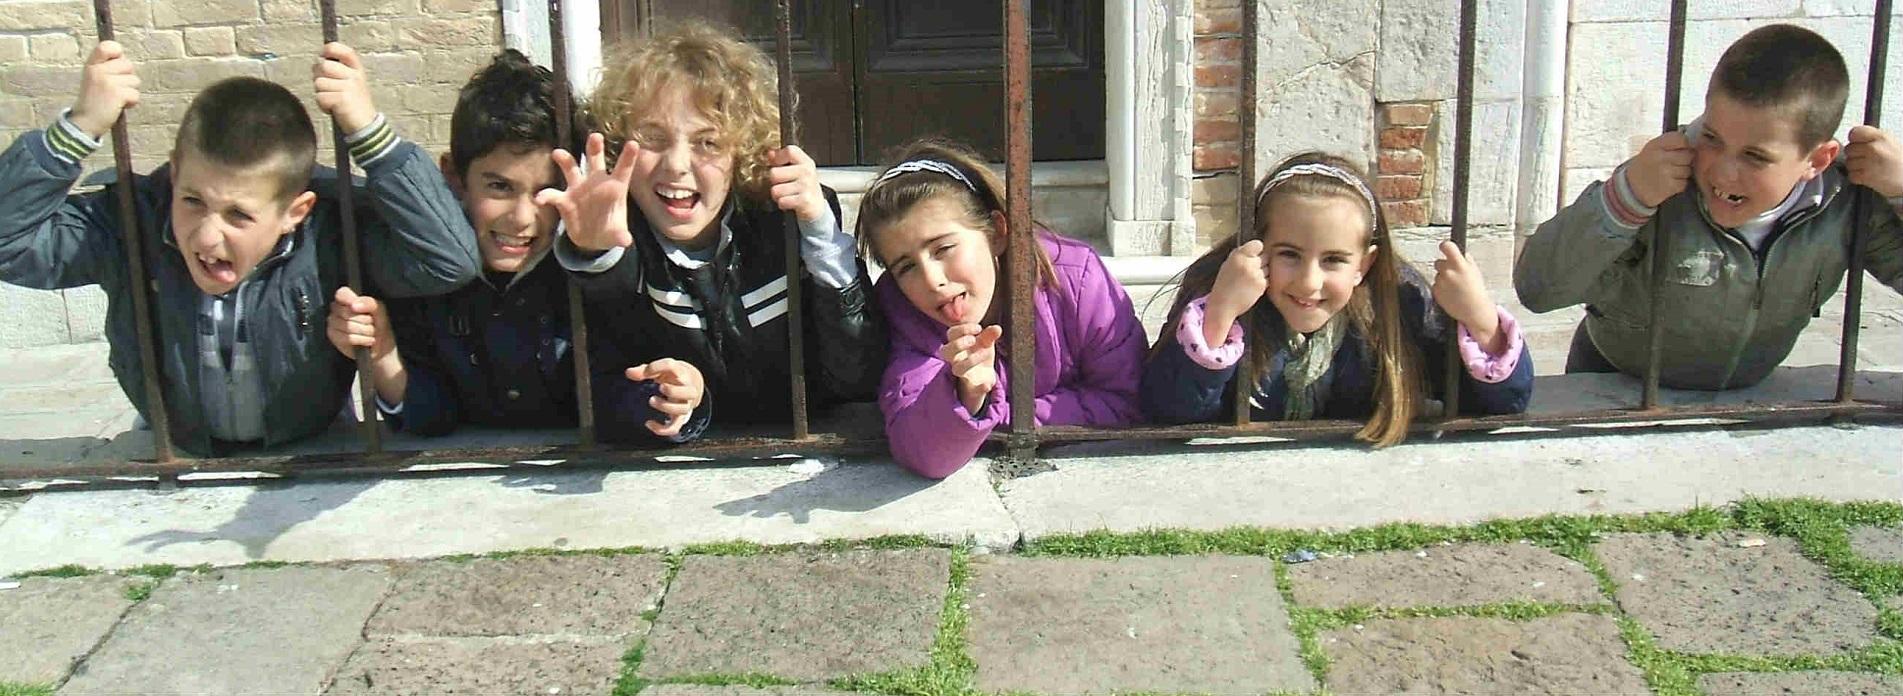 roaring-kids-having-fun-in-Venice2